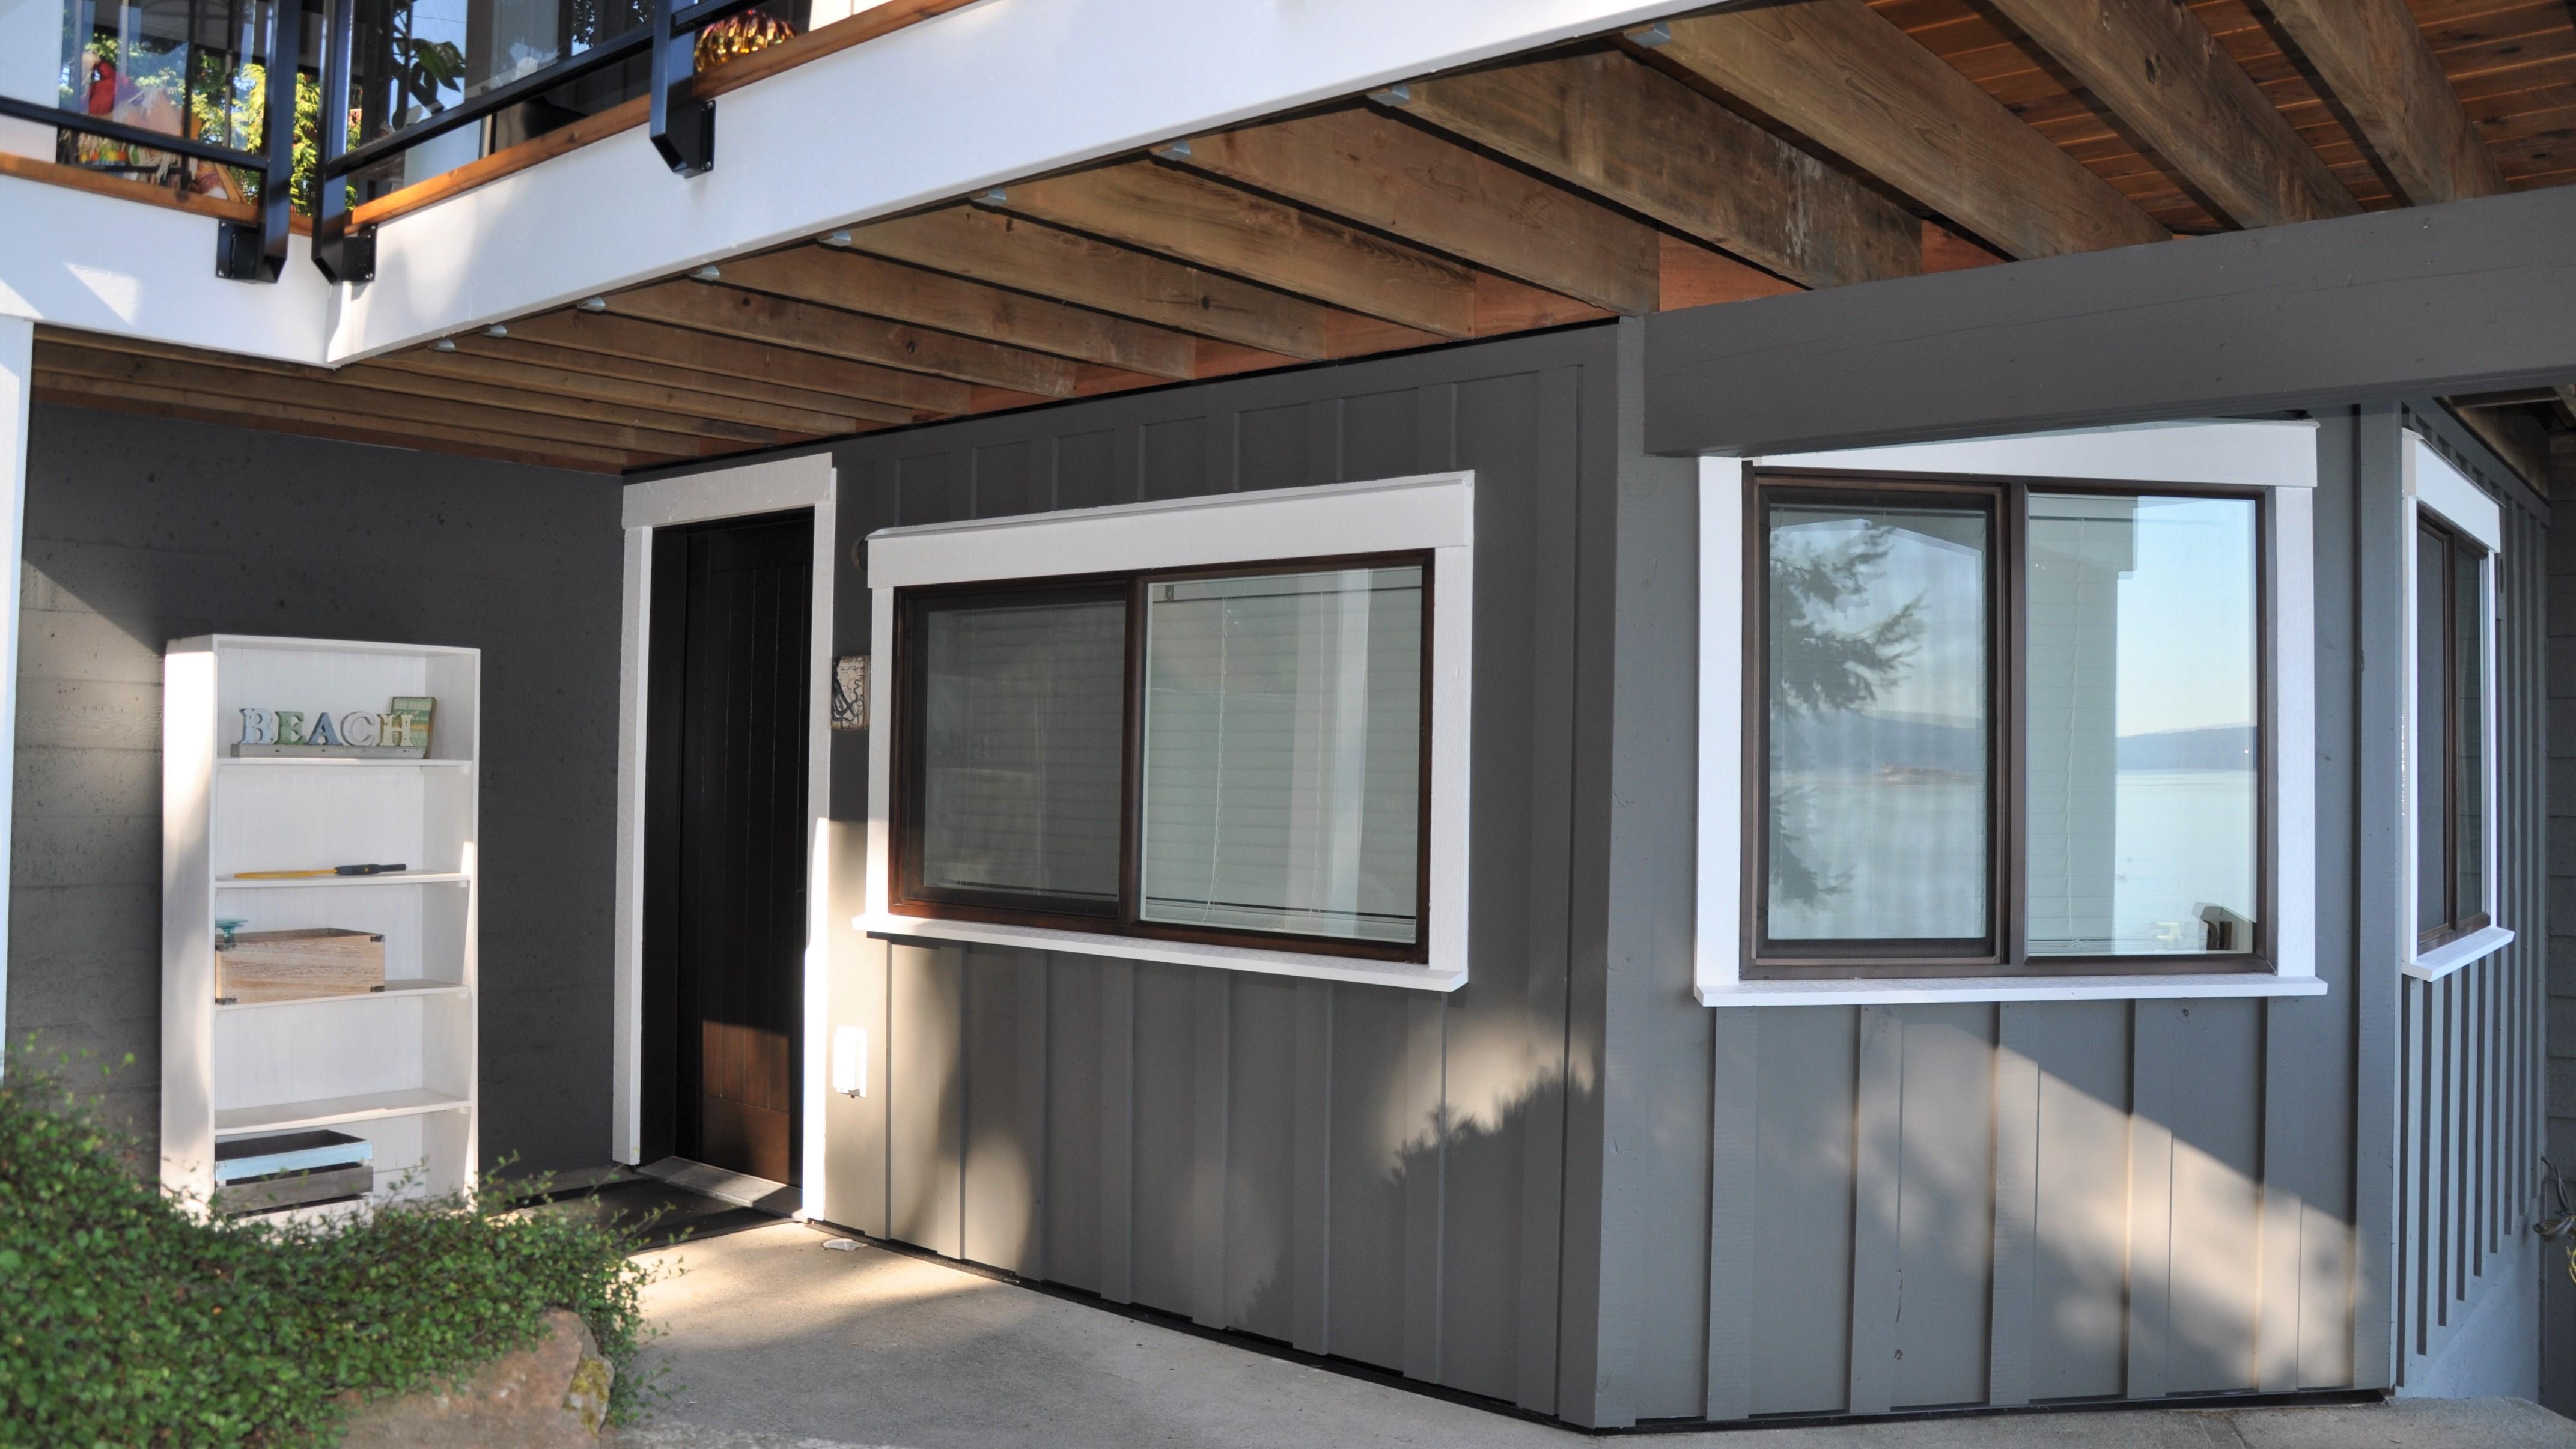 Emperor Homes Ltd - Bare Point Custom Renovaton Phase 2 - Basement Exterior